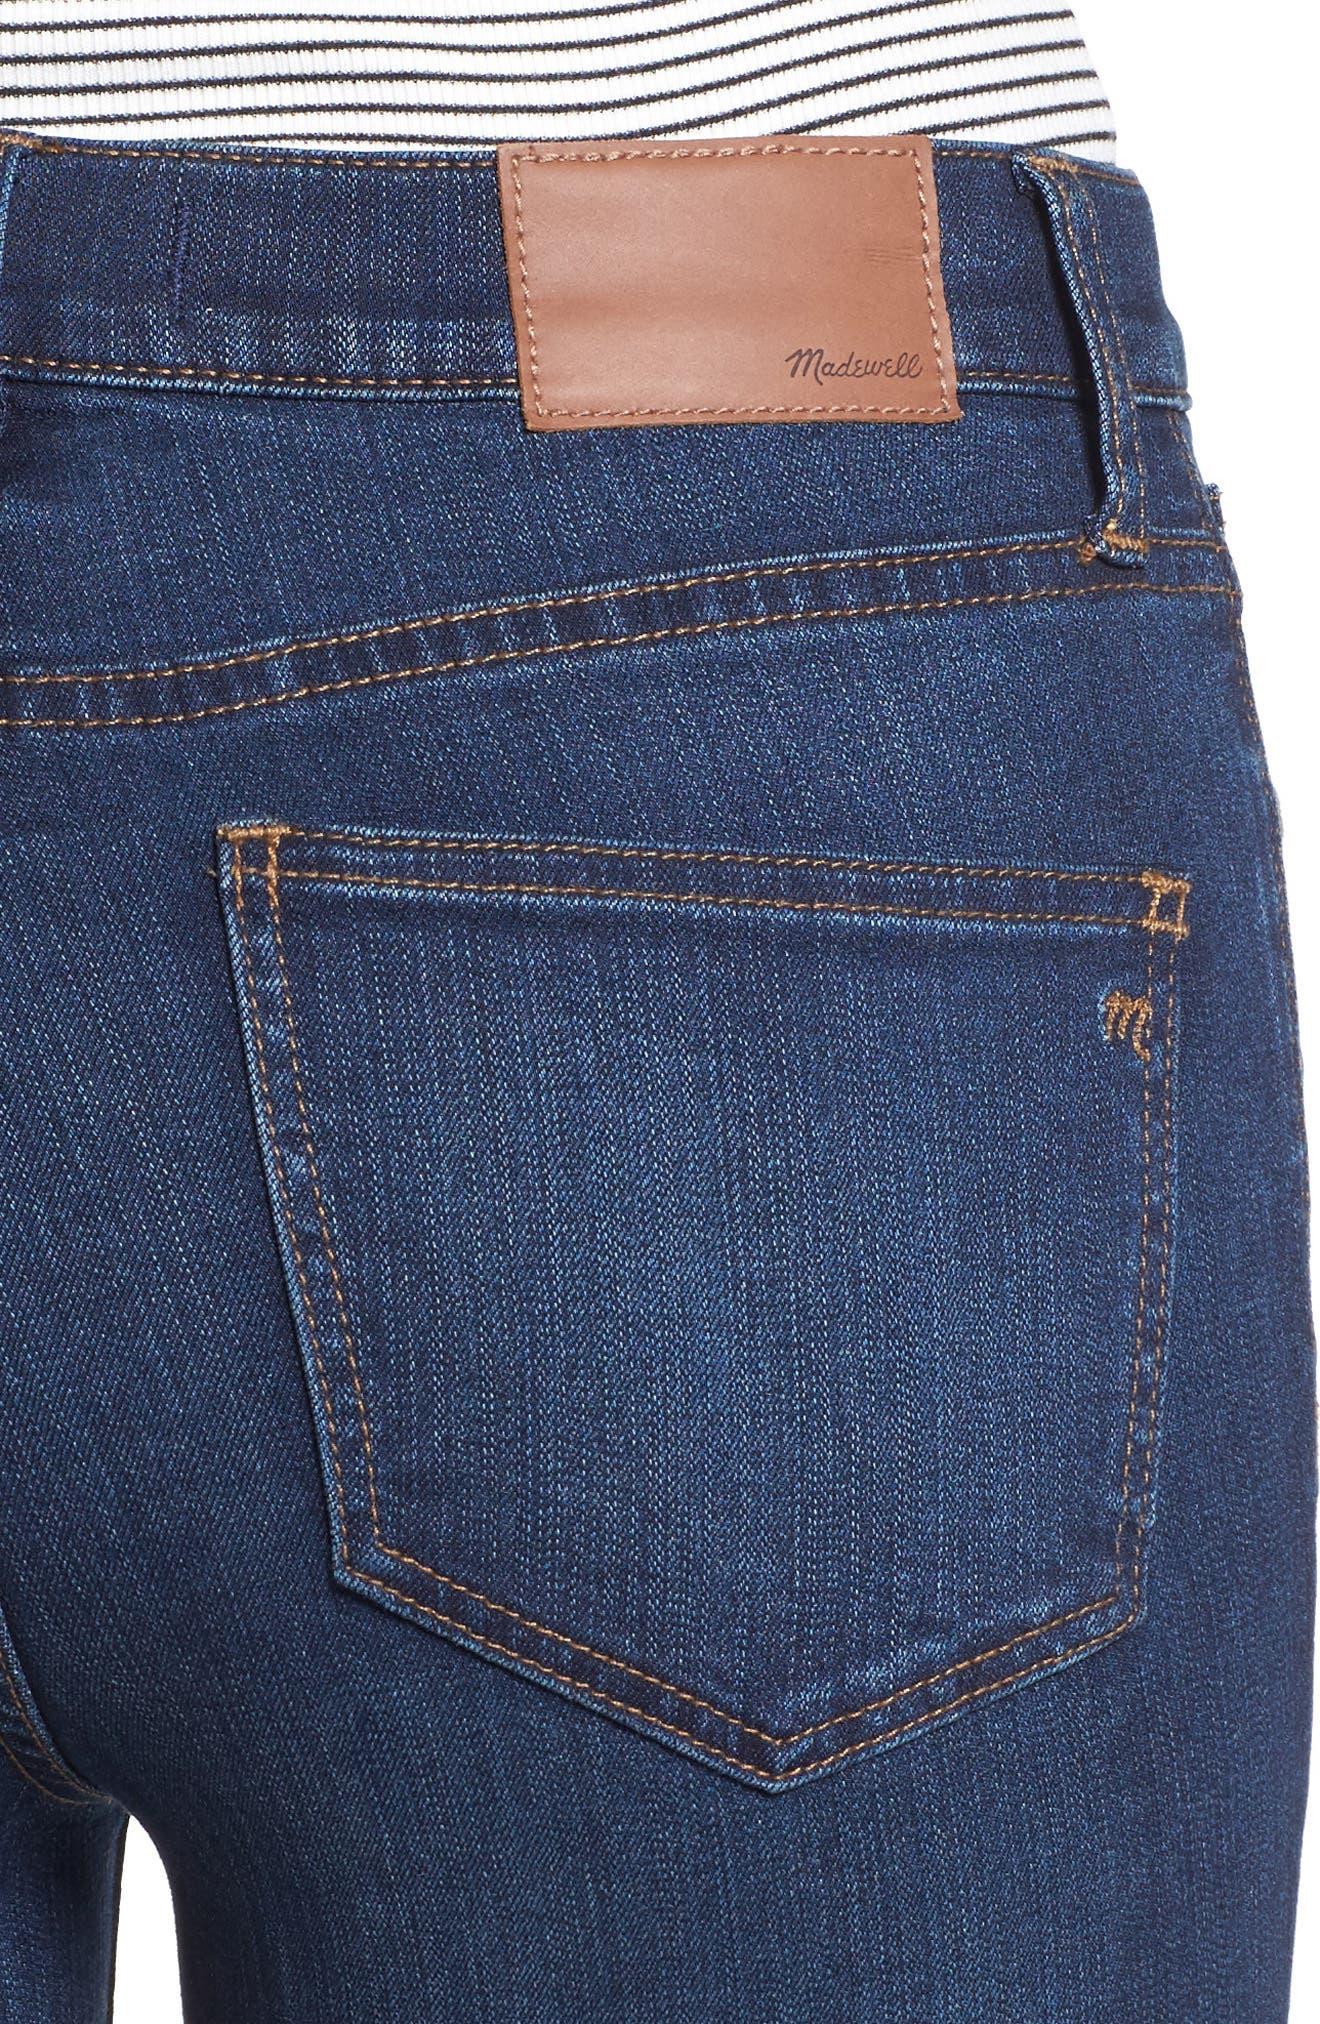 Alternate Image 4  - Madewell Roadtripper Jeans (Darryl Wash)